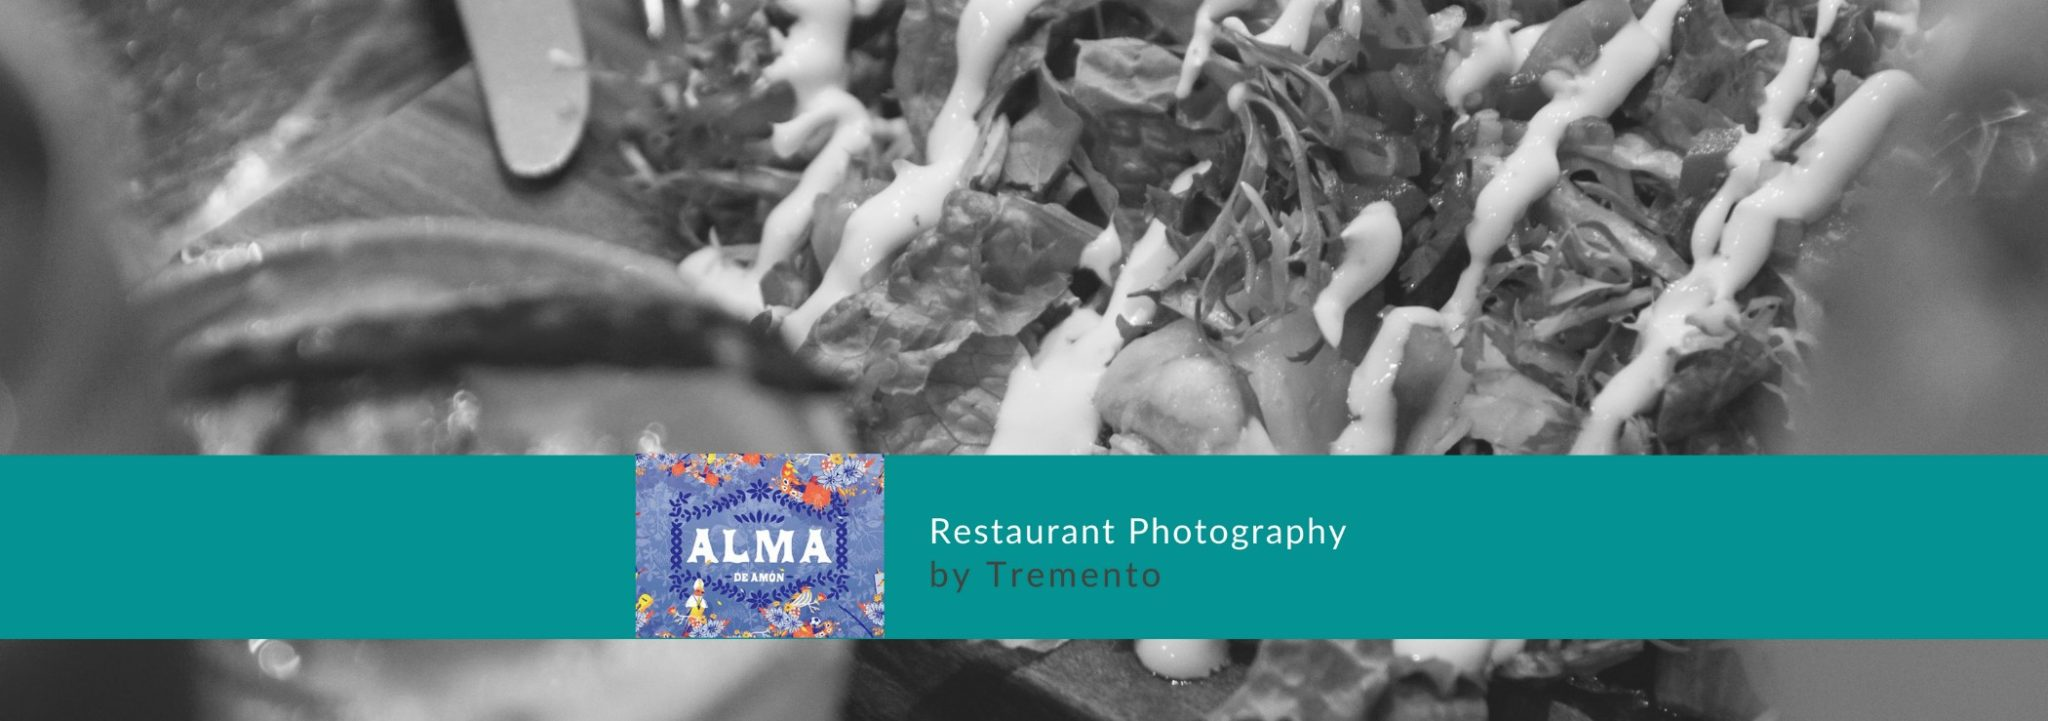 Café Restaurant Photography - Alma de Amon - San José - Tremento